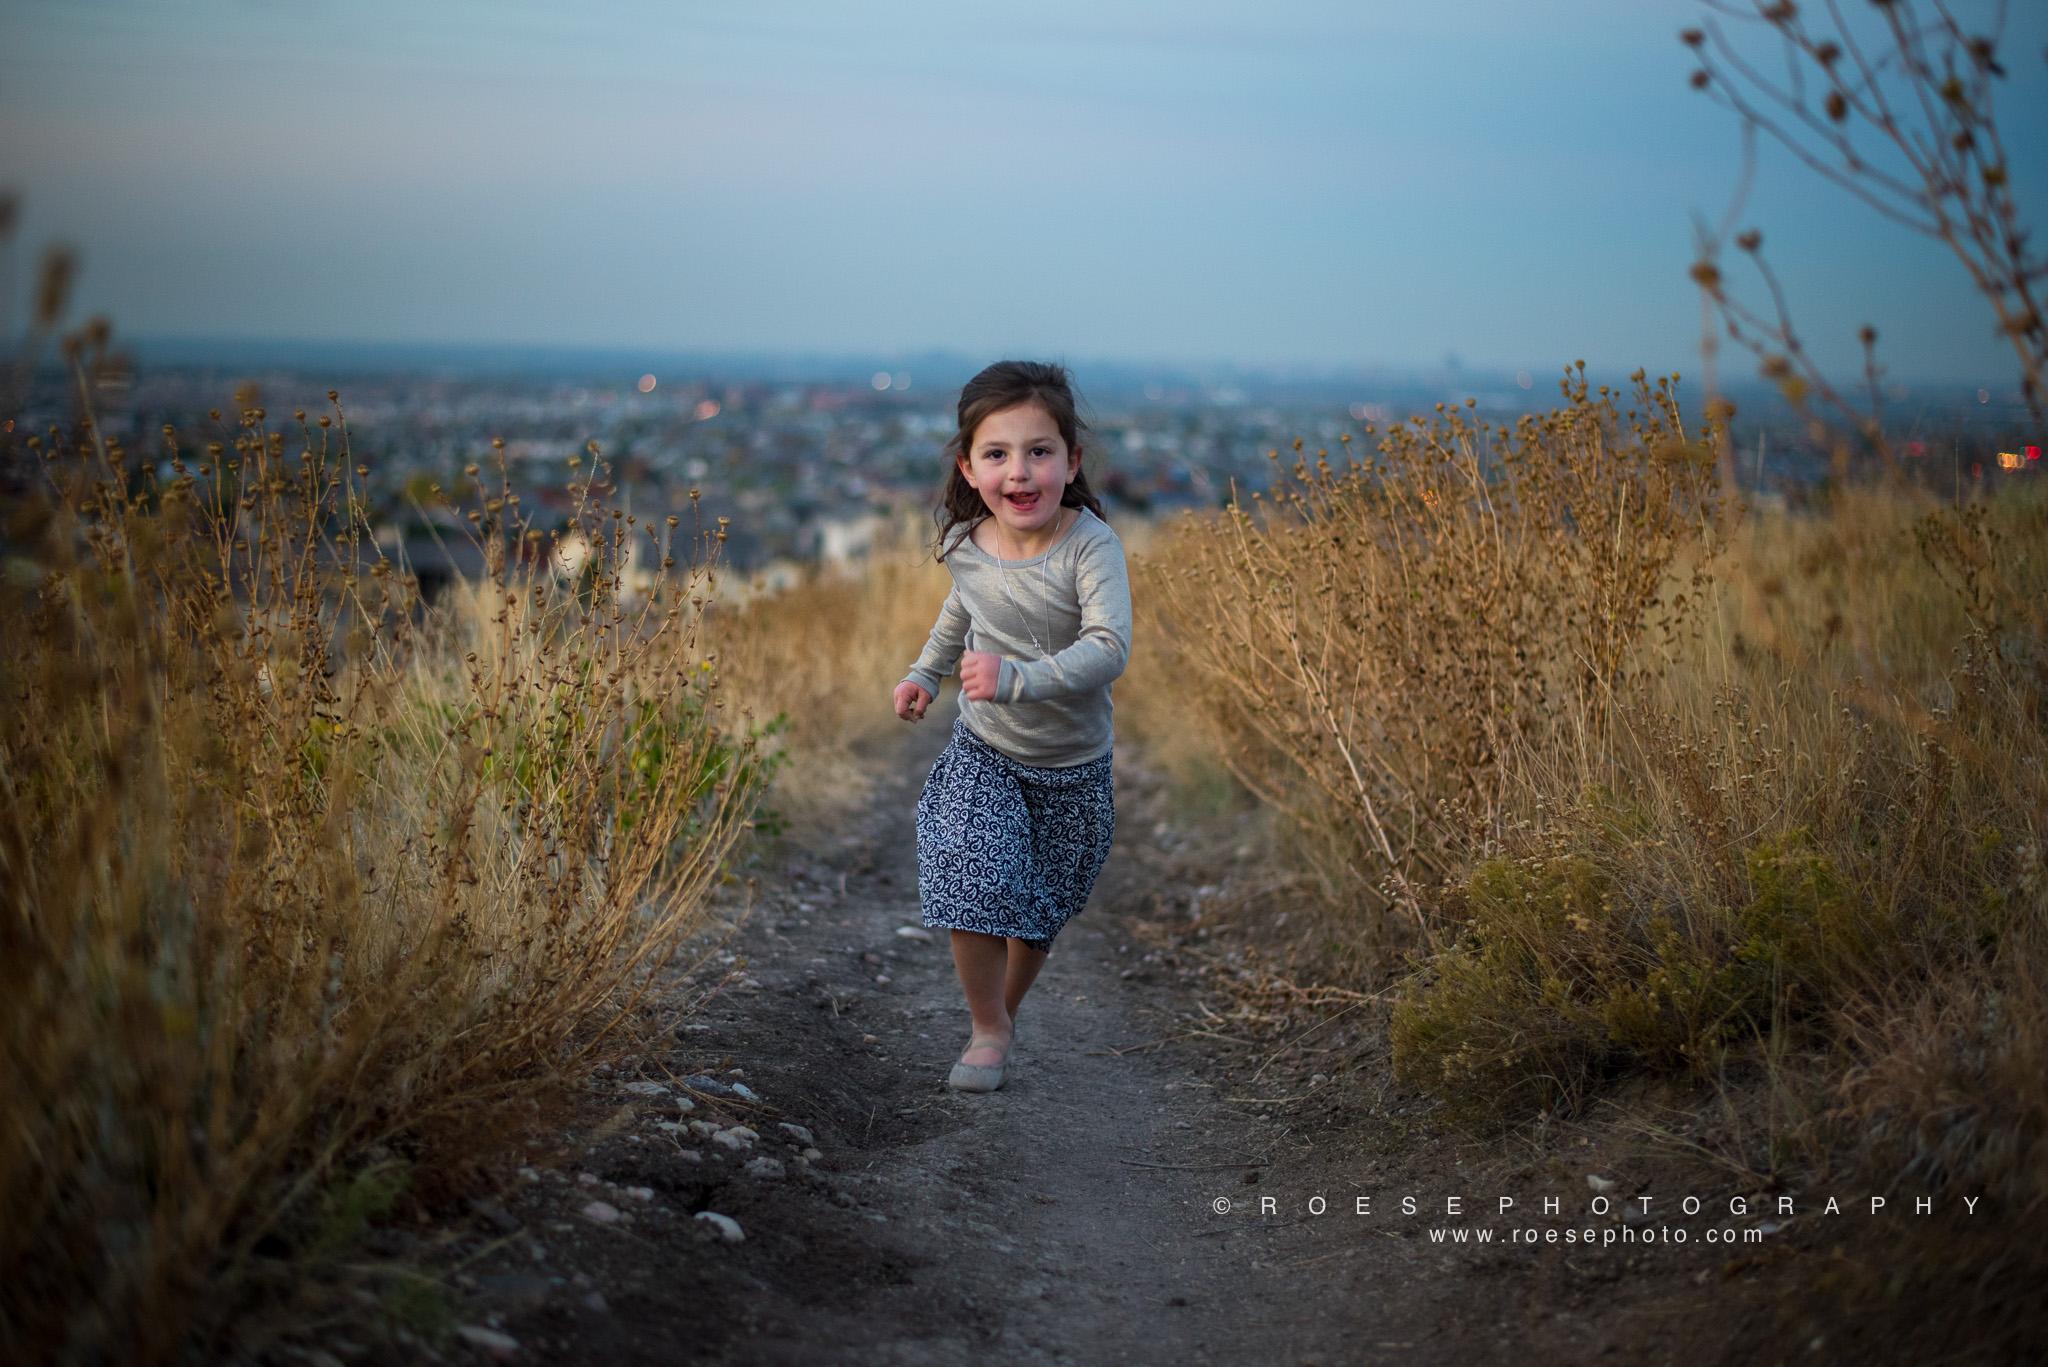 C.-Roese-Ramp-Roese-Photography-LLC.-Bennett-Family-32.jpg